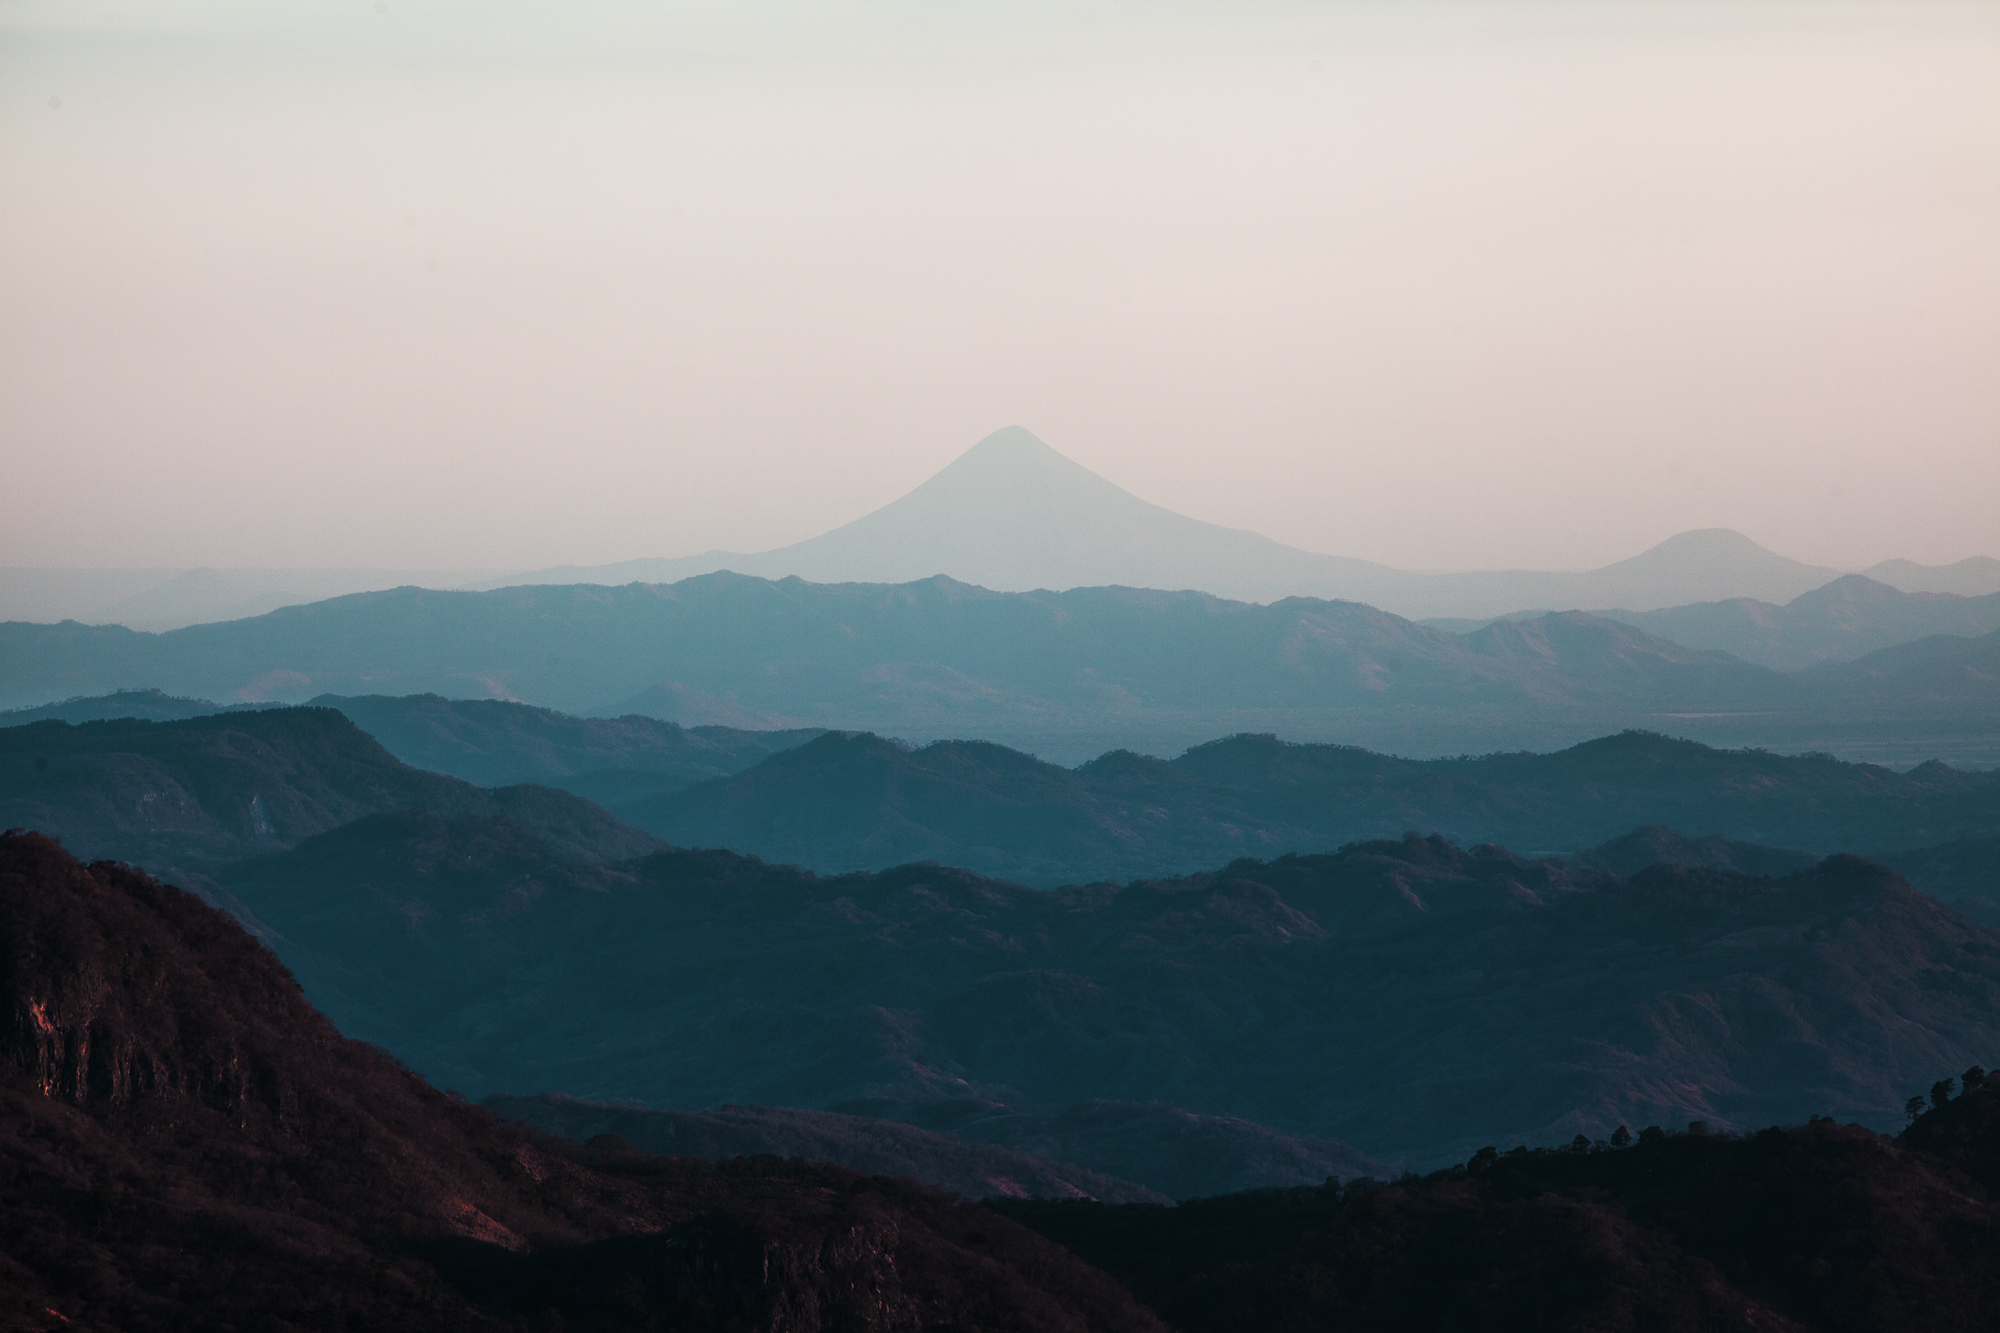 View of volcano San Cristobal from Cusmapa